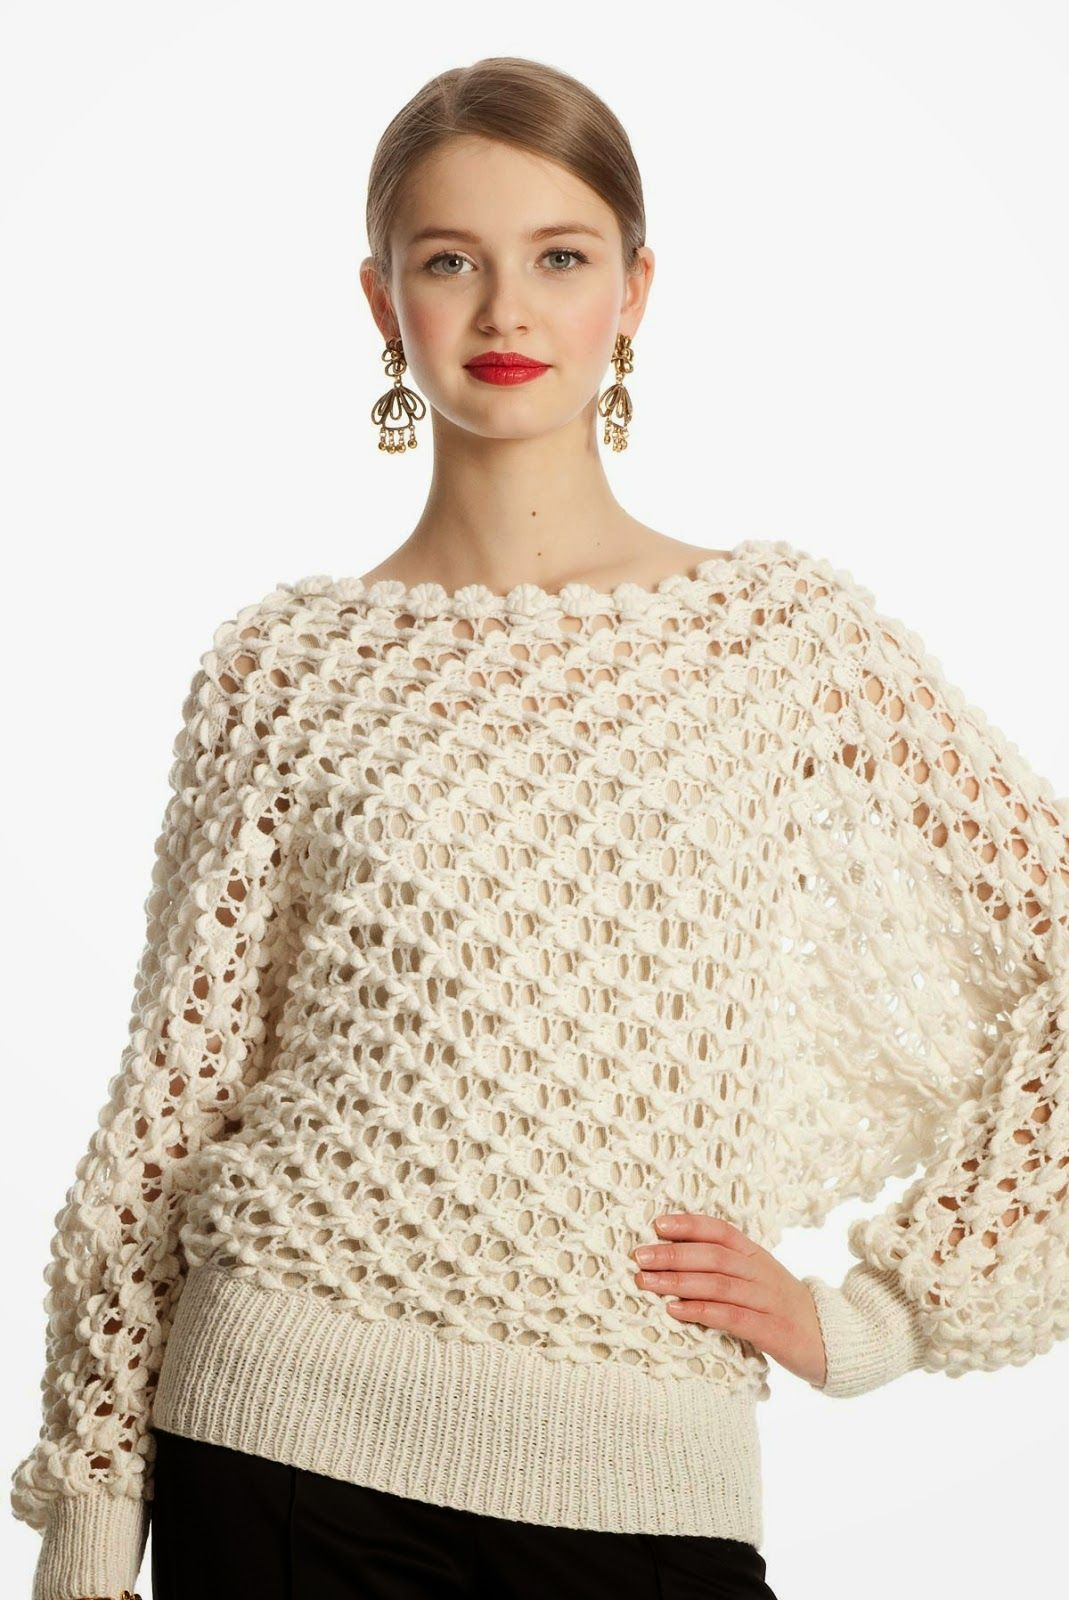 Punto Mariposa en Crochet Tutorial - Patrones Crochet #crochet ...